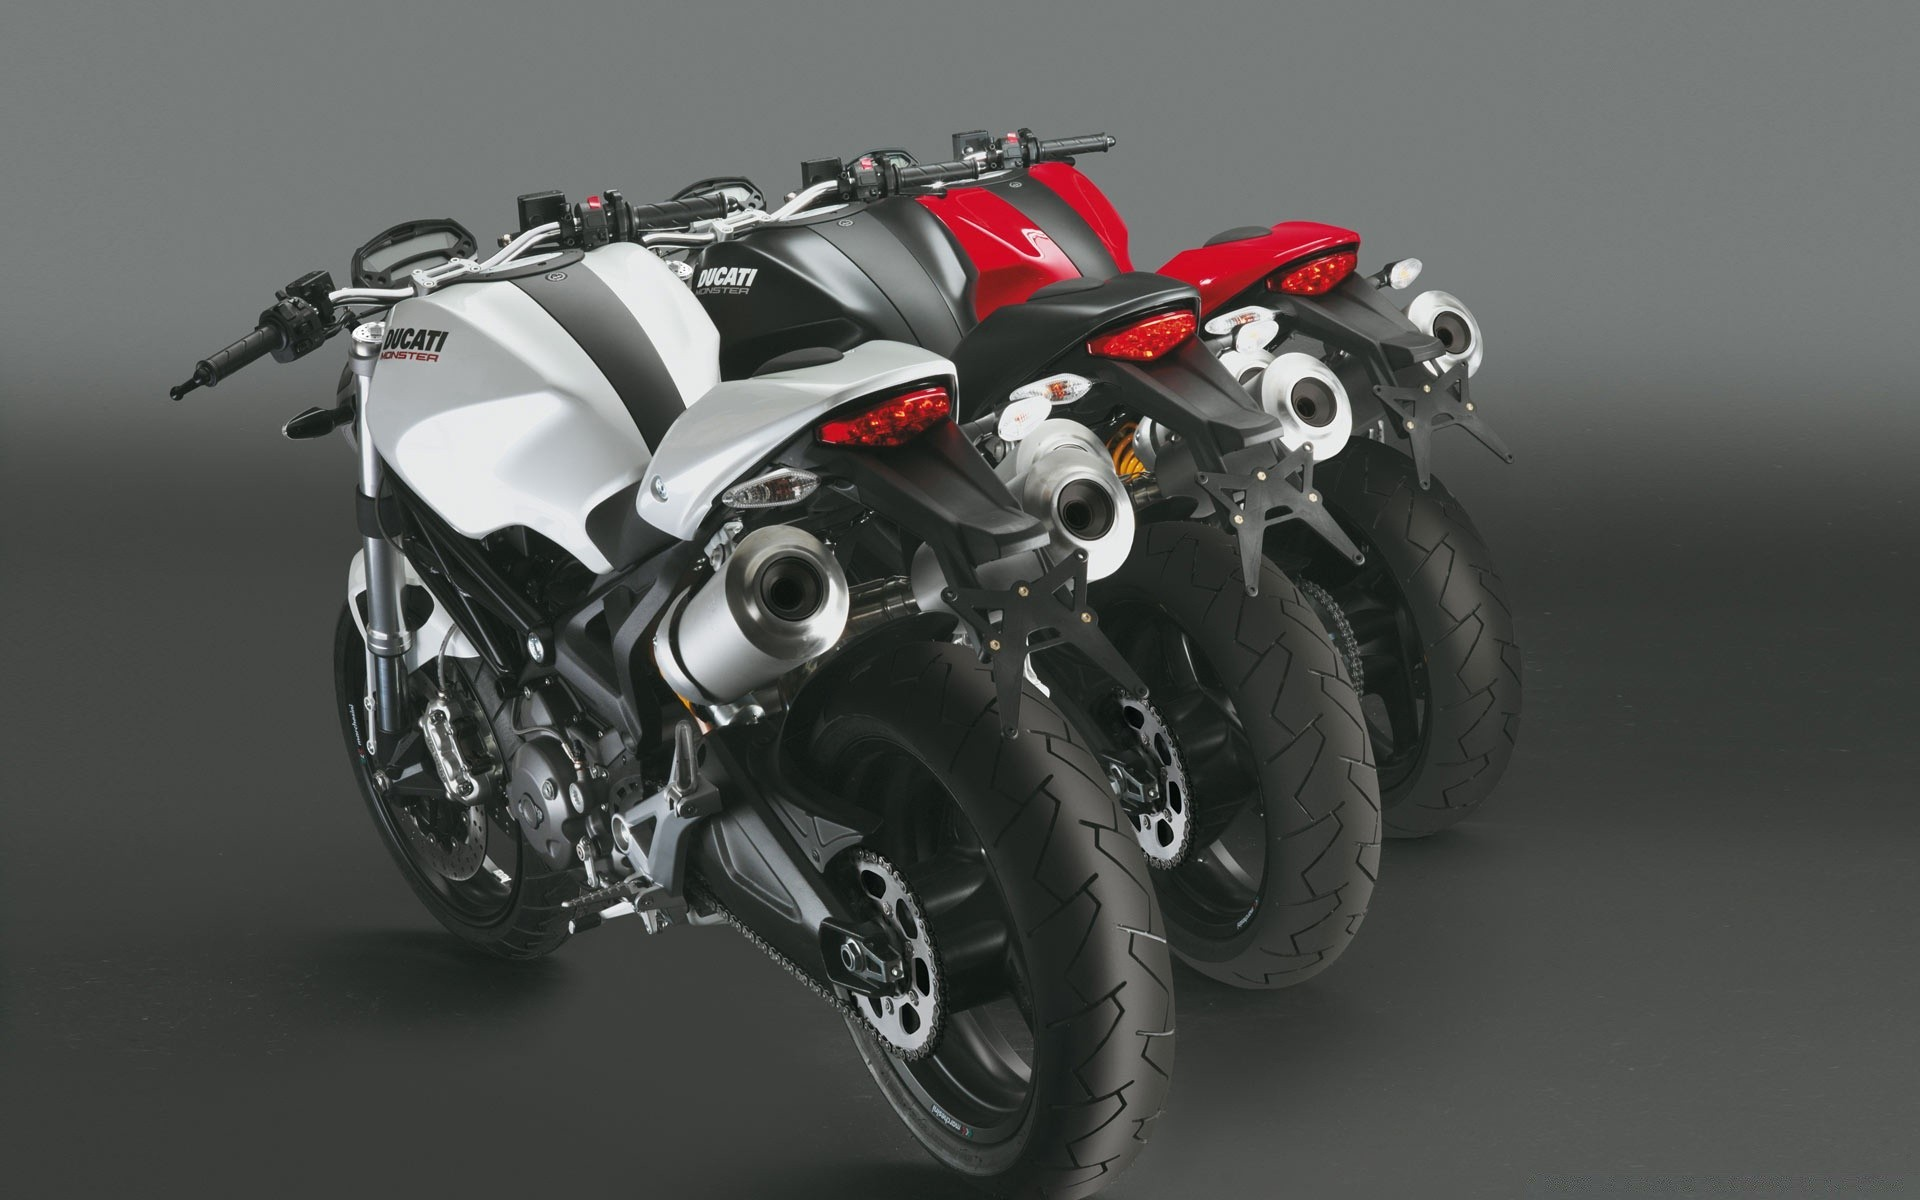 Обои Мотоцикл, просто монстр, хром. Мотоциклы foto 8